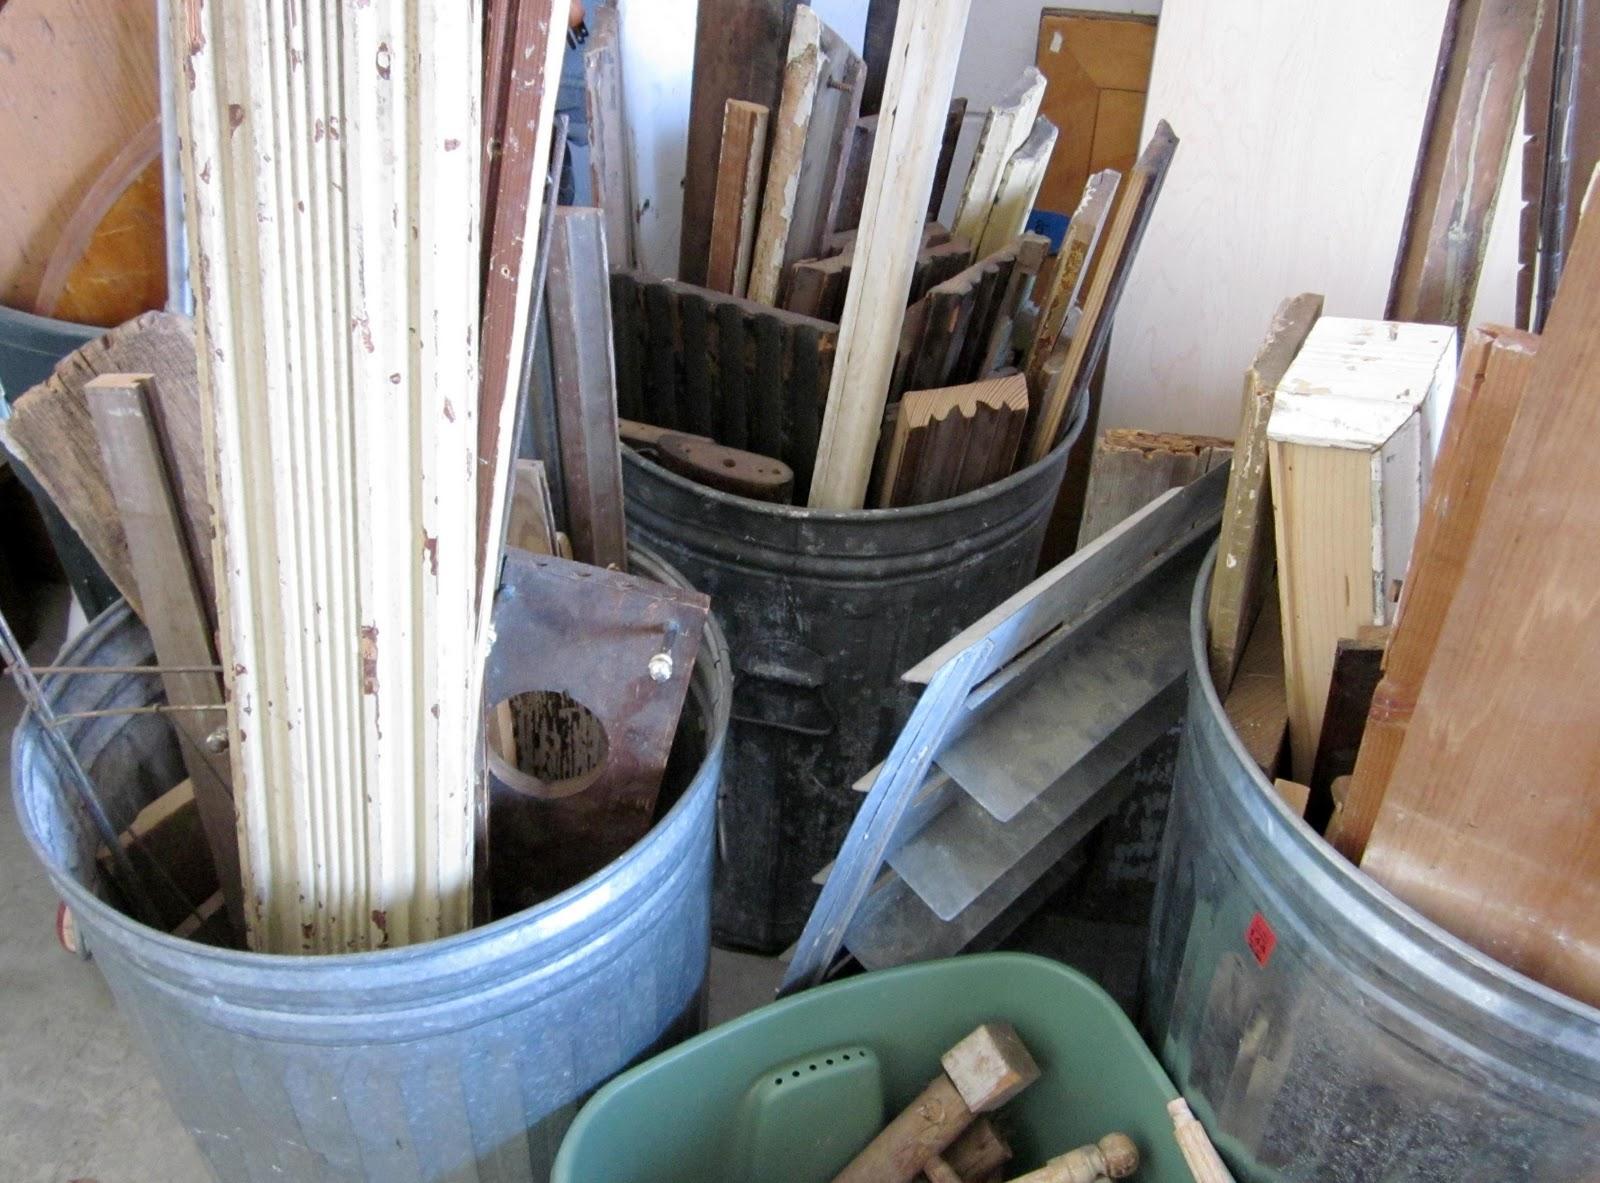 Junker's wood scrap pile paradise